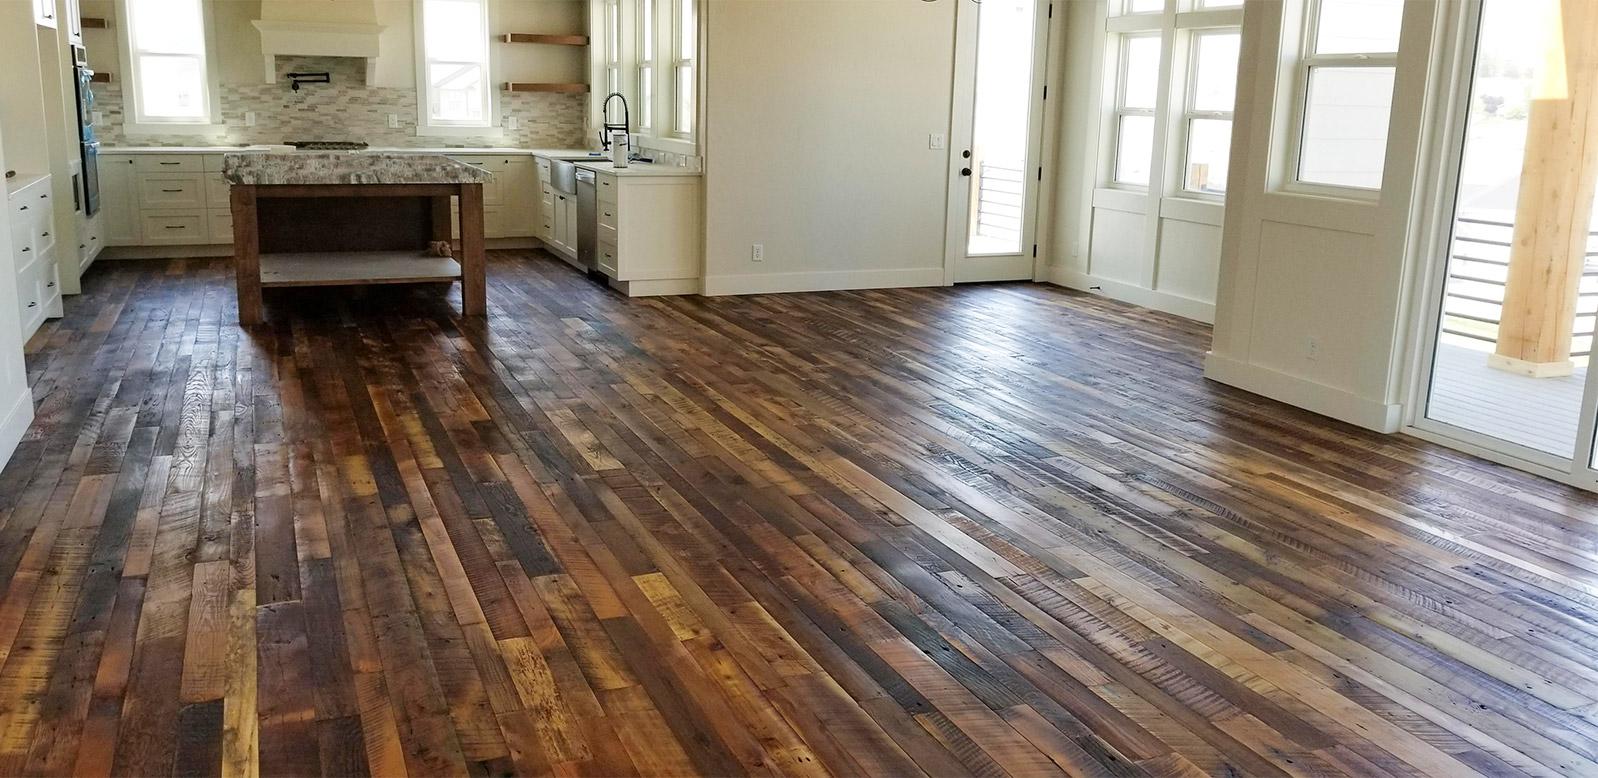 5 Top Hardwood Flooring Trends For 2020 Abita Wood Floors